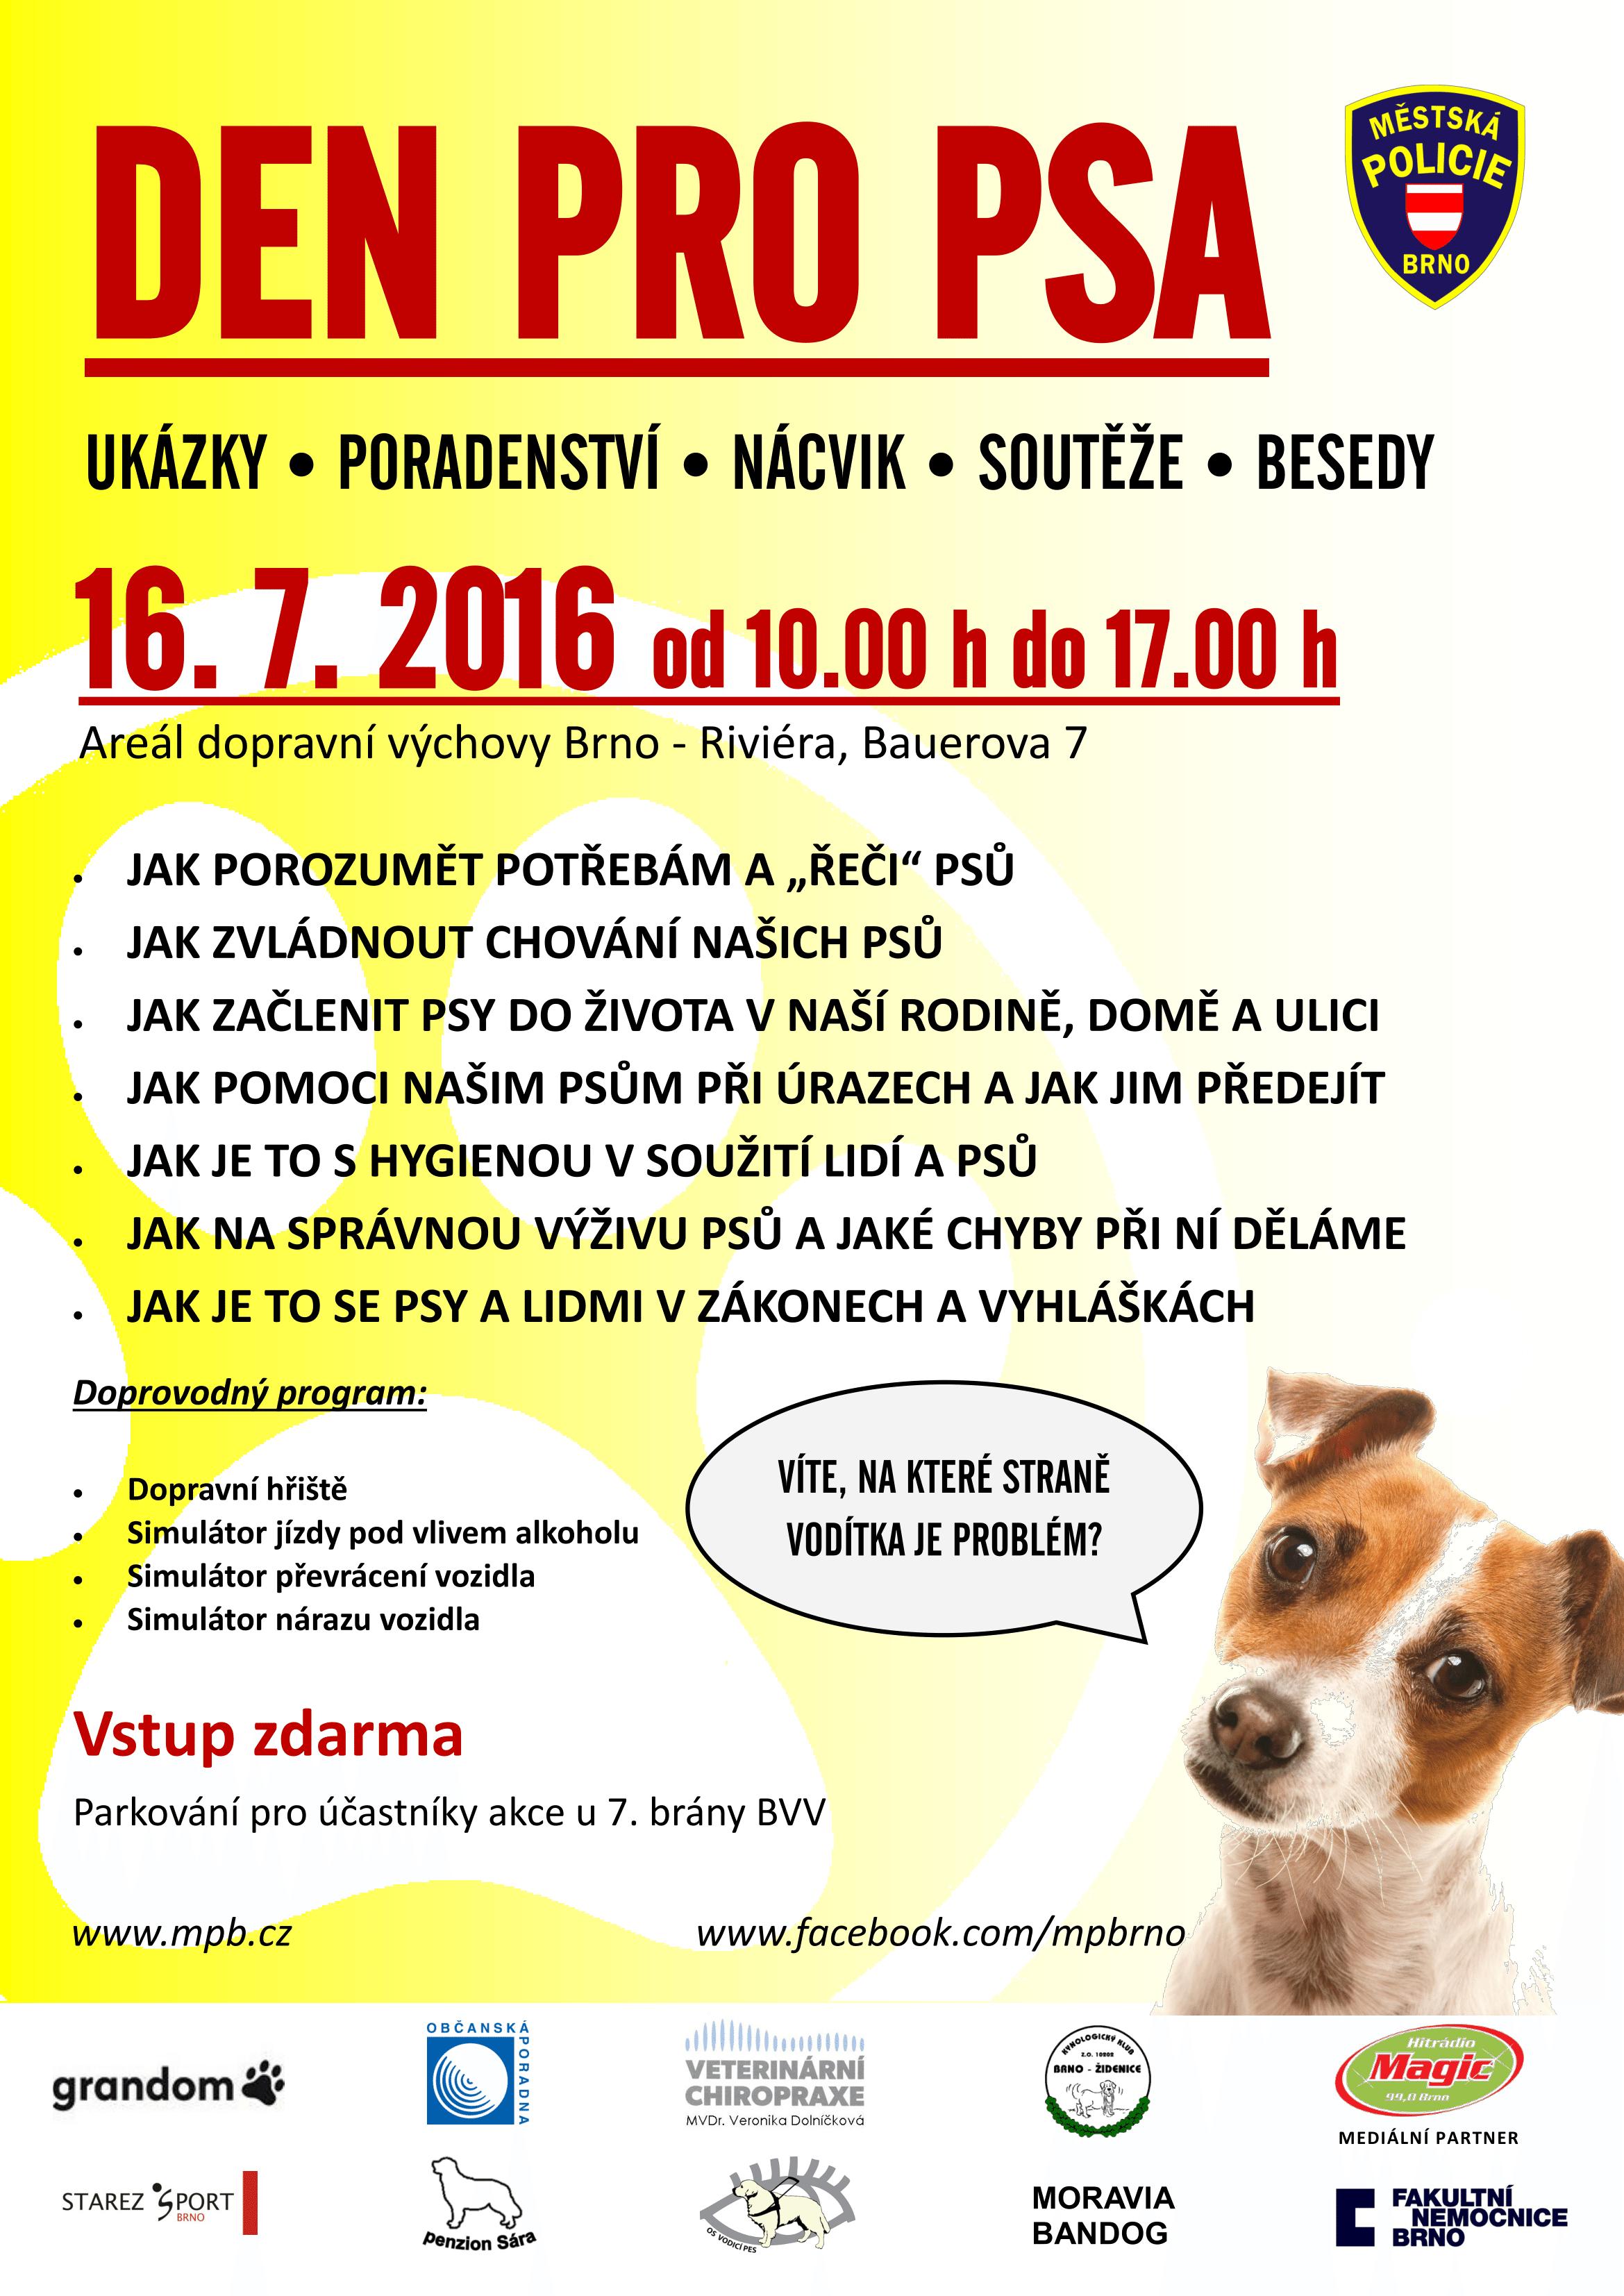 DEN PRO PSA 2016-1